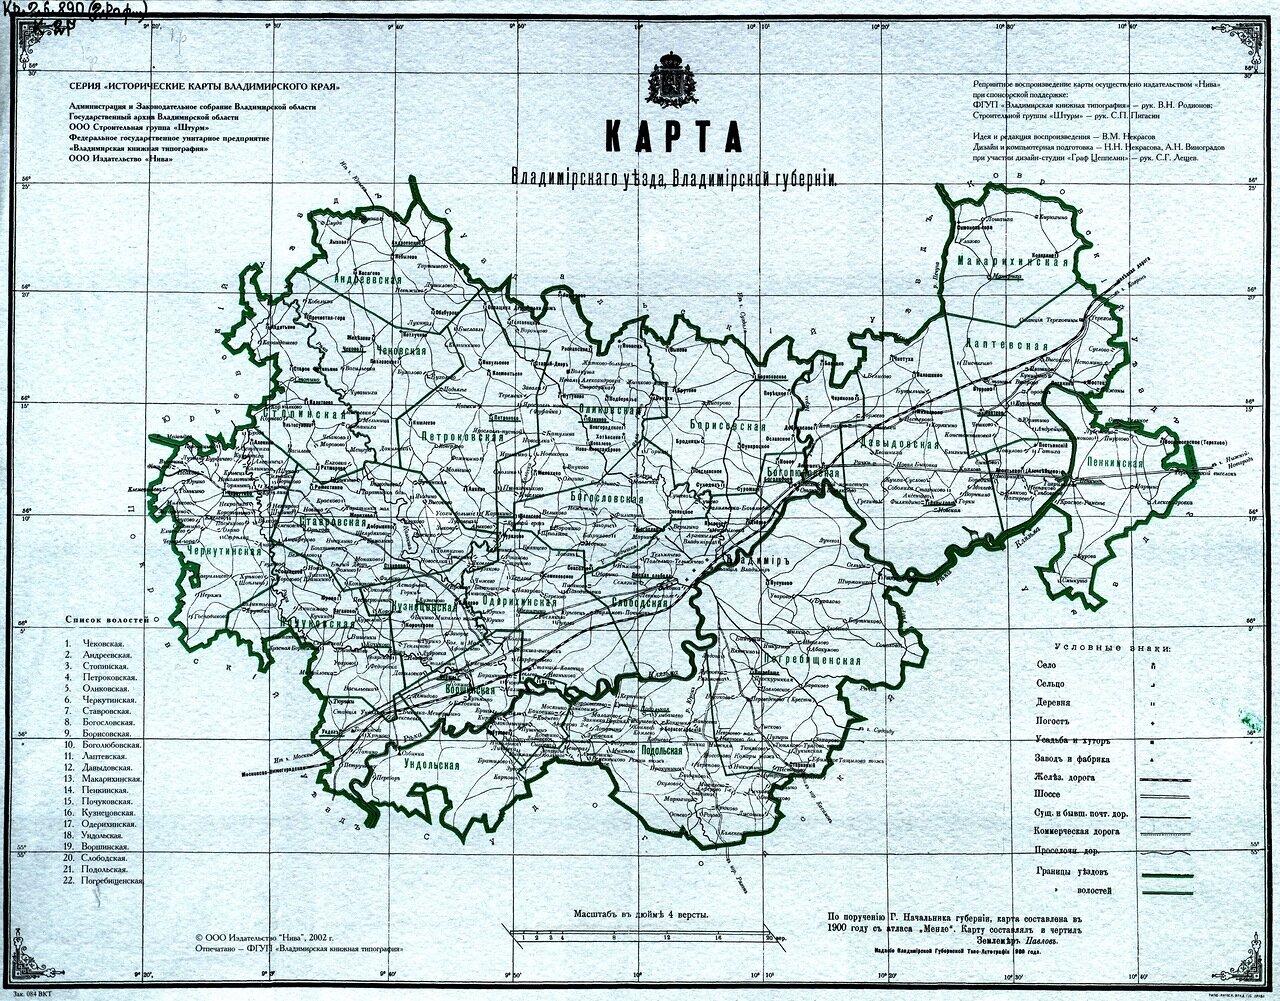 1900. Карта Владимирского уезда, Владимирской губернии.